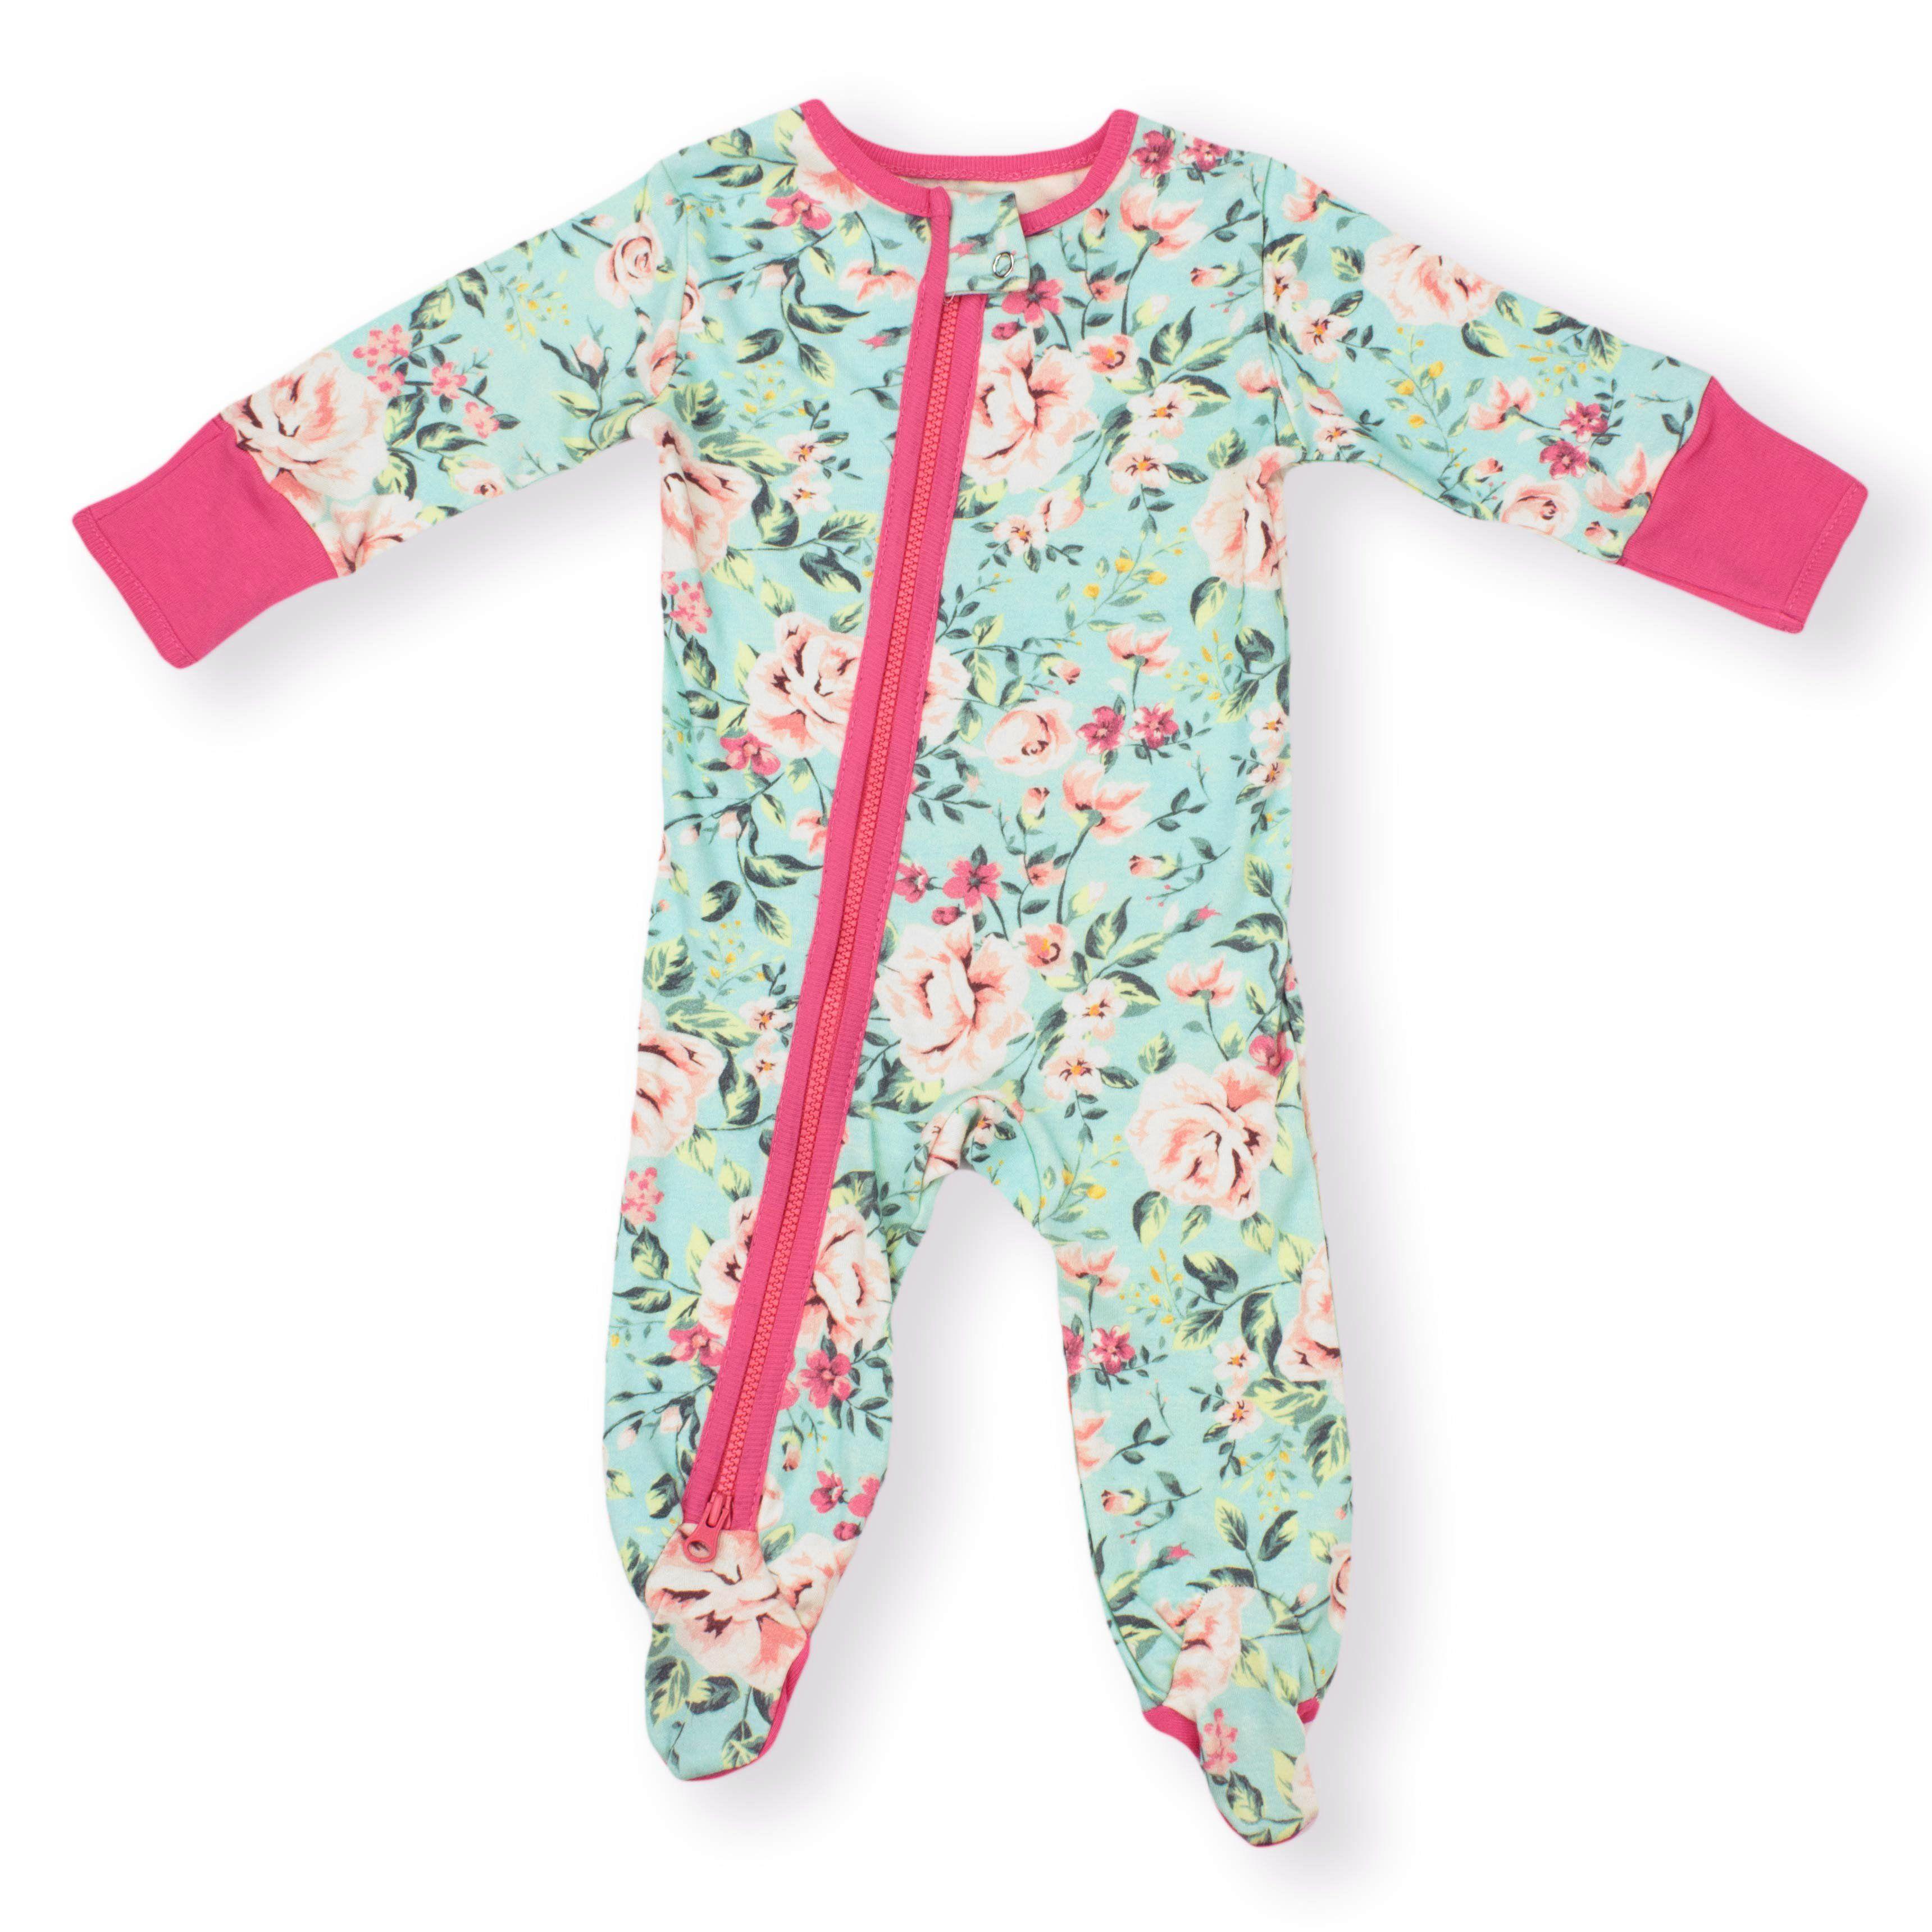 d98cfe56fcd8 Organic Baby Zipper Sleeper Pajamas 2-way Zip  Antique Rose ...